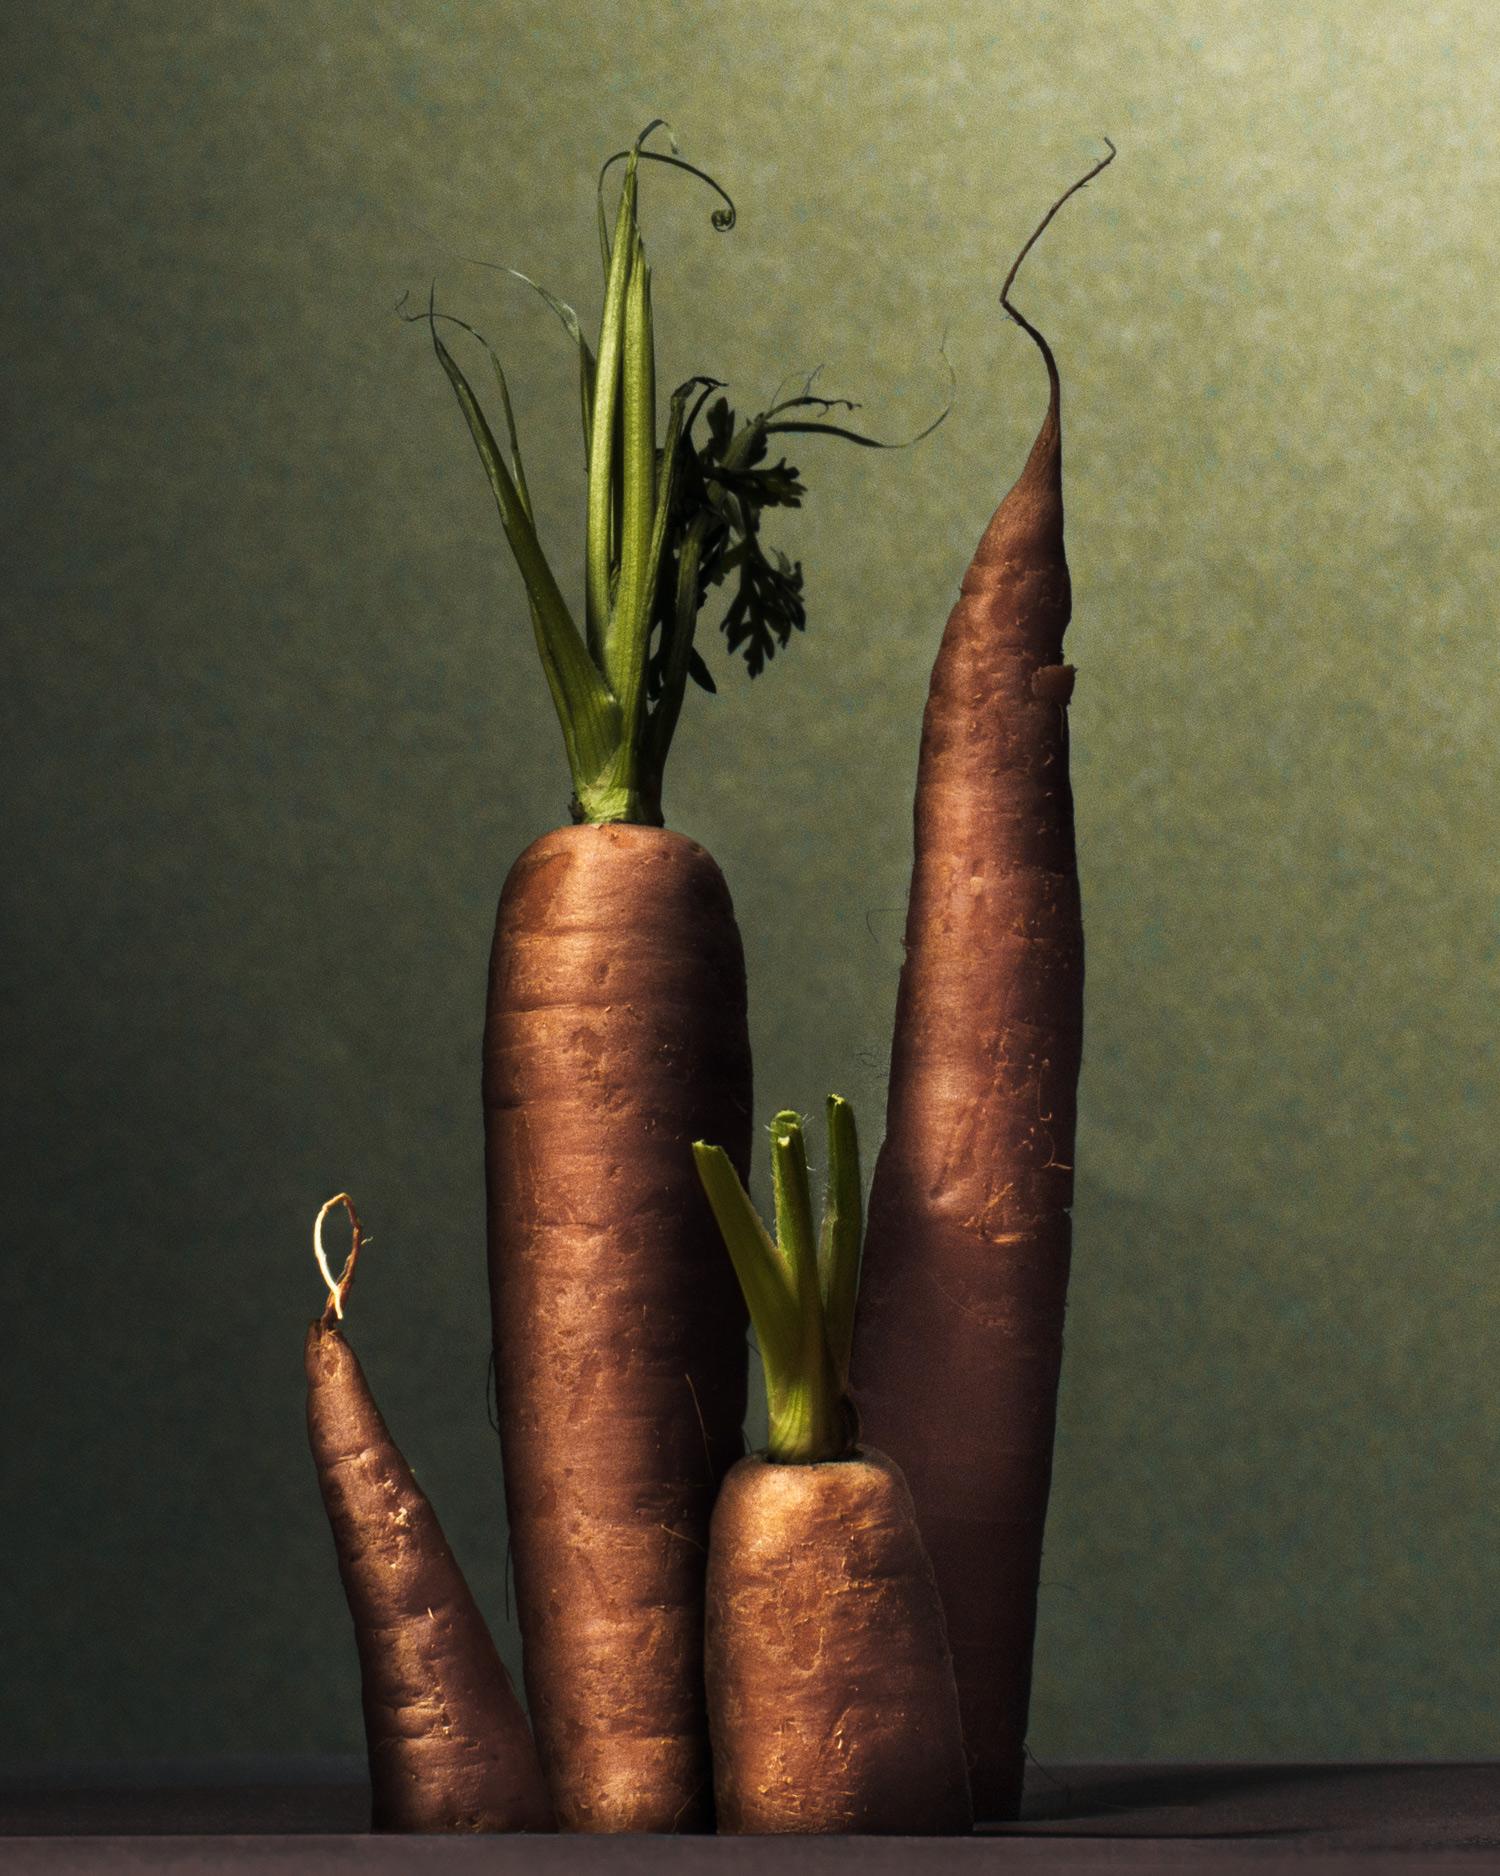 carrots-matthew-kashtan-photography.jpg